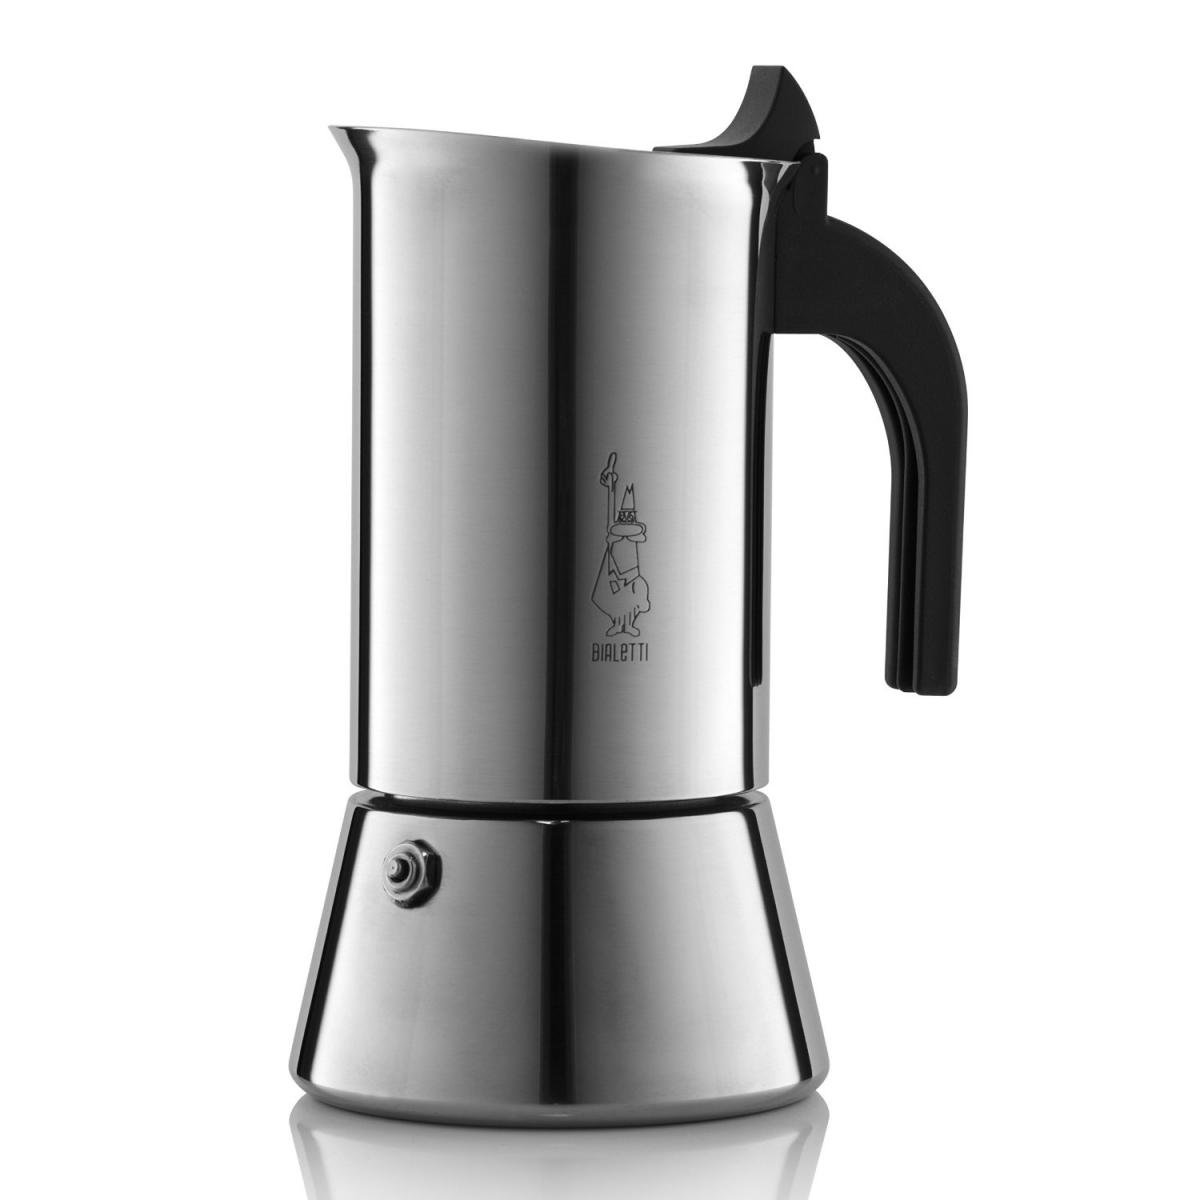 Bialetti kávovar Venus - 6 šálků